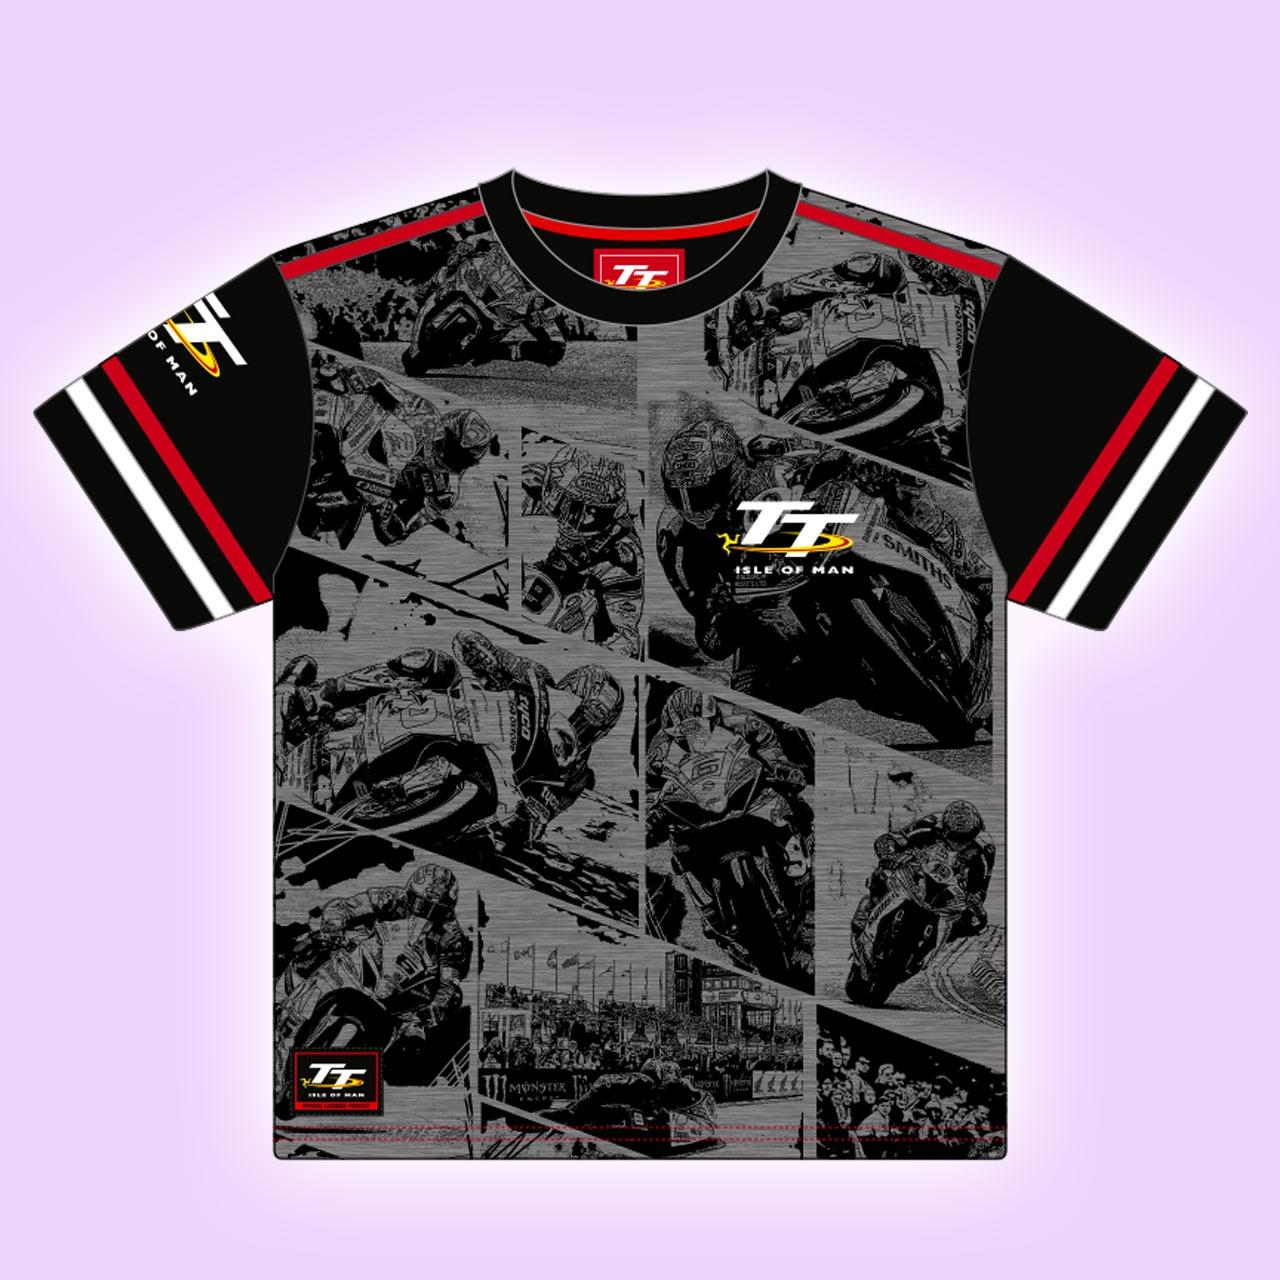 c35133a8c ALL OVER PRINT BIKE MOTIF TT KIDS T-SHIRT 18ZKAOP1 | T-SHIRTS - KIDS | TT  Shirts | Manx Shirts